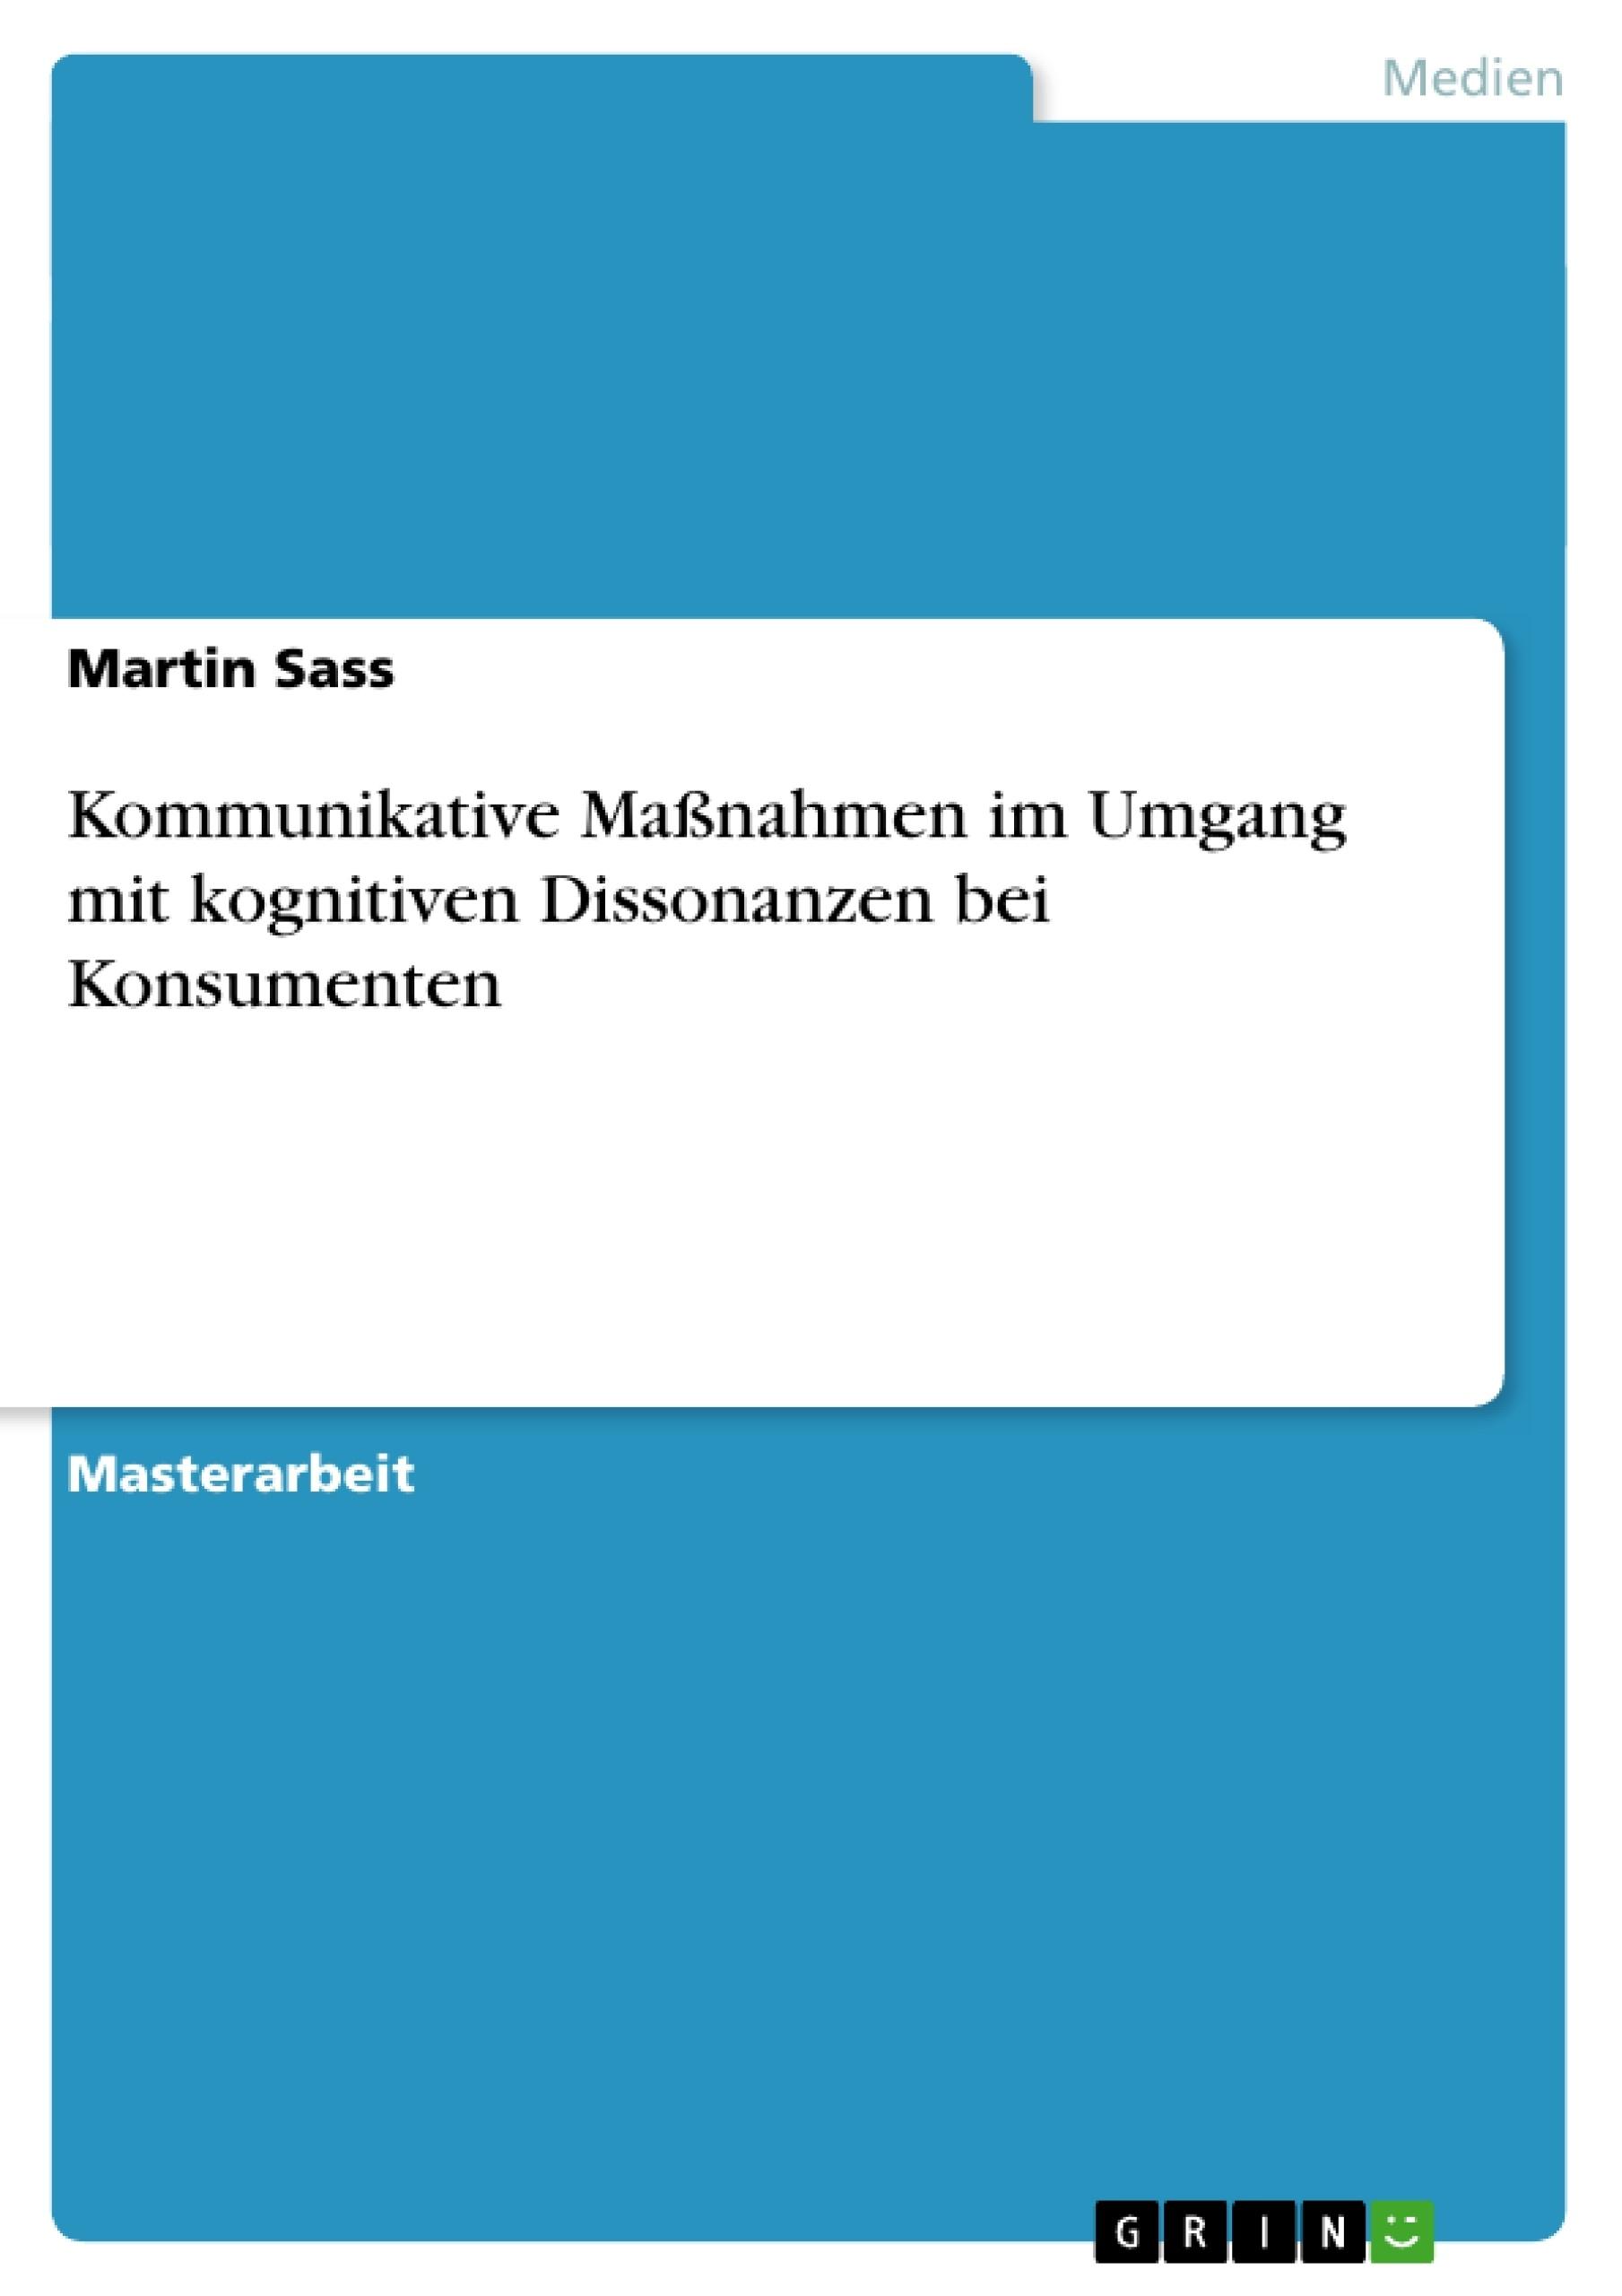 Titel: Kommunikative Maßnahmen im Umgang mit kognitiven Dissonanzen bei Konsumenten